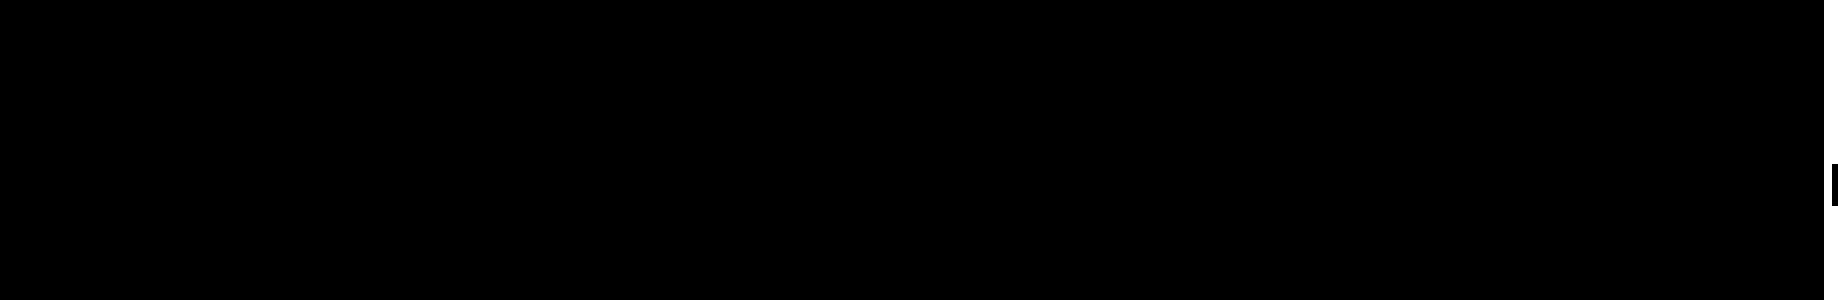 LaBella logo.png